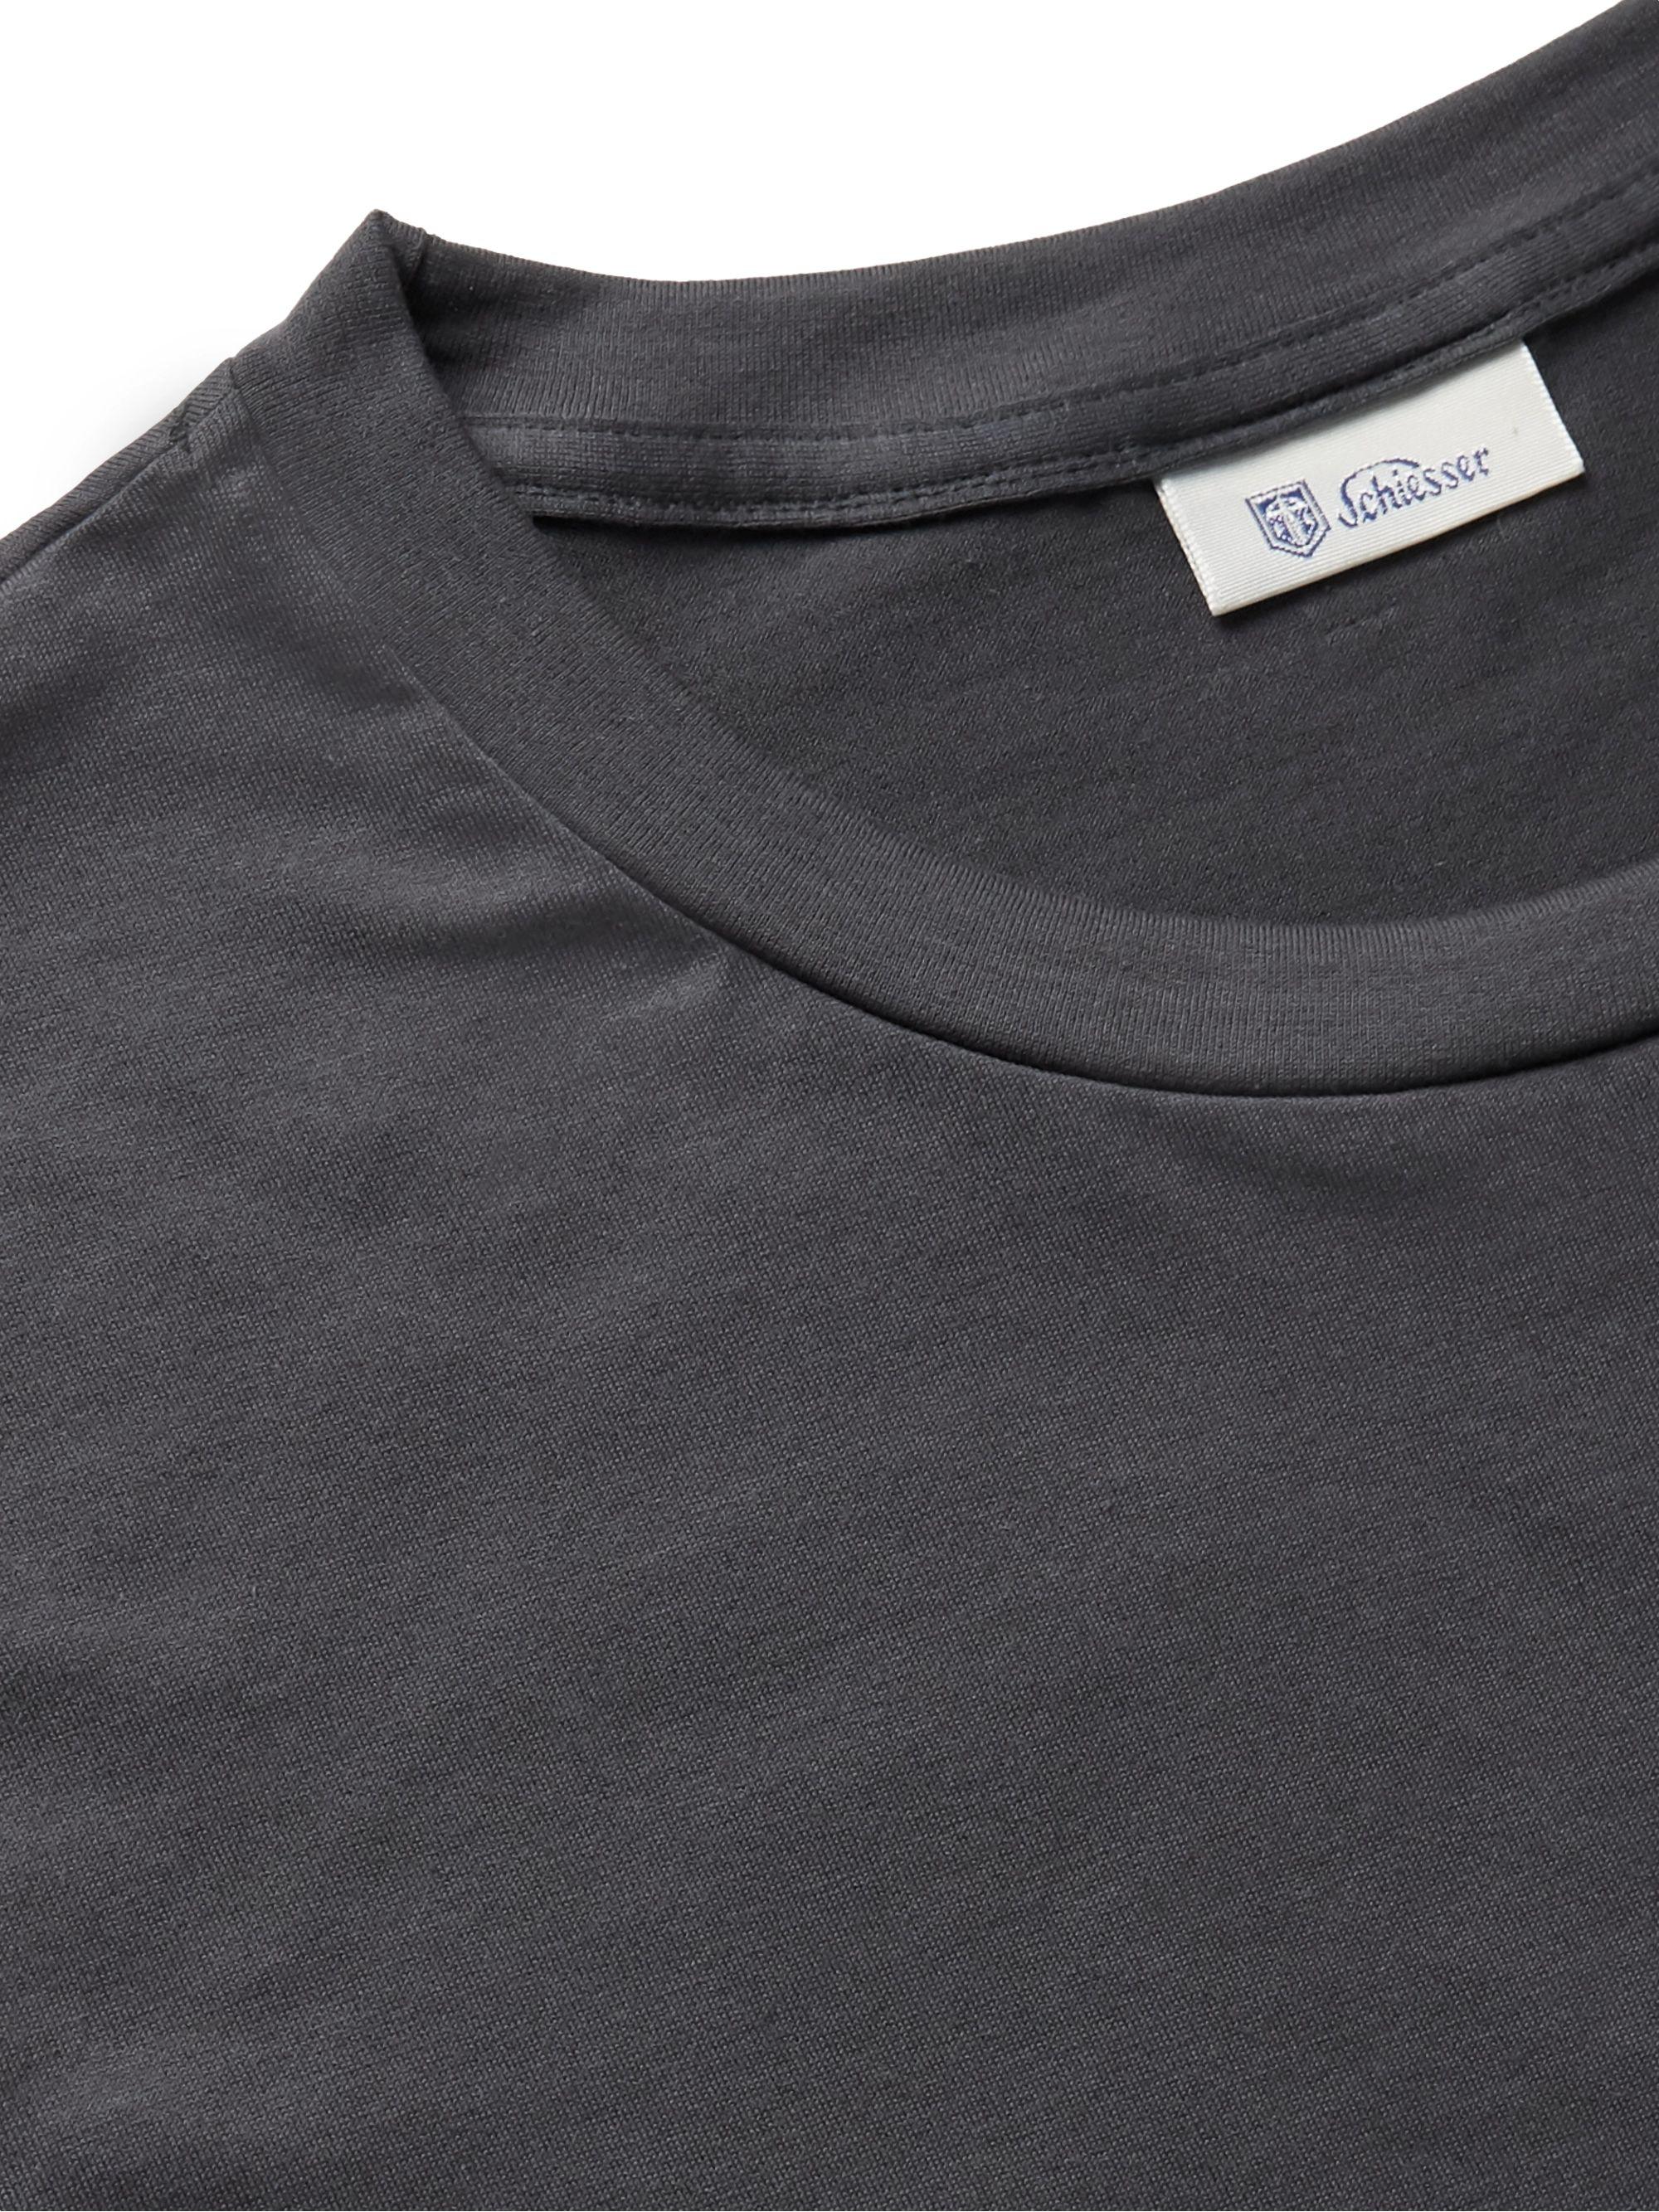 Josef Cotton Jersey Pyjama T Shirt